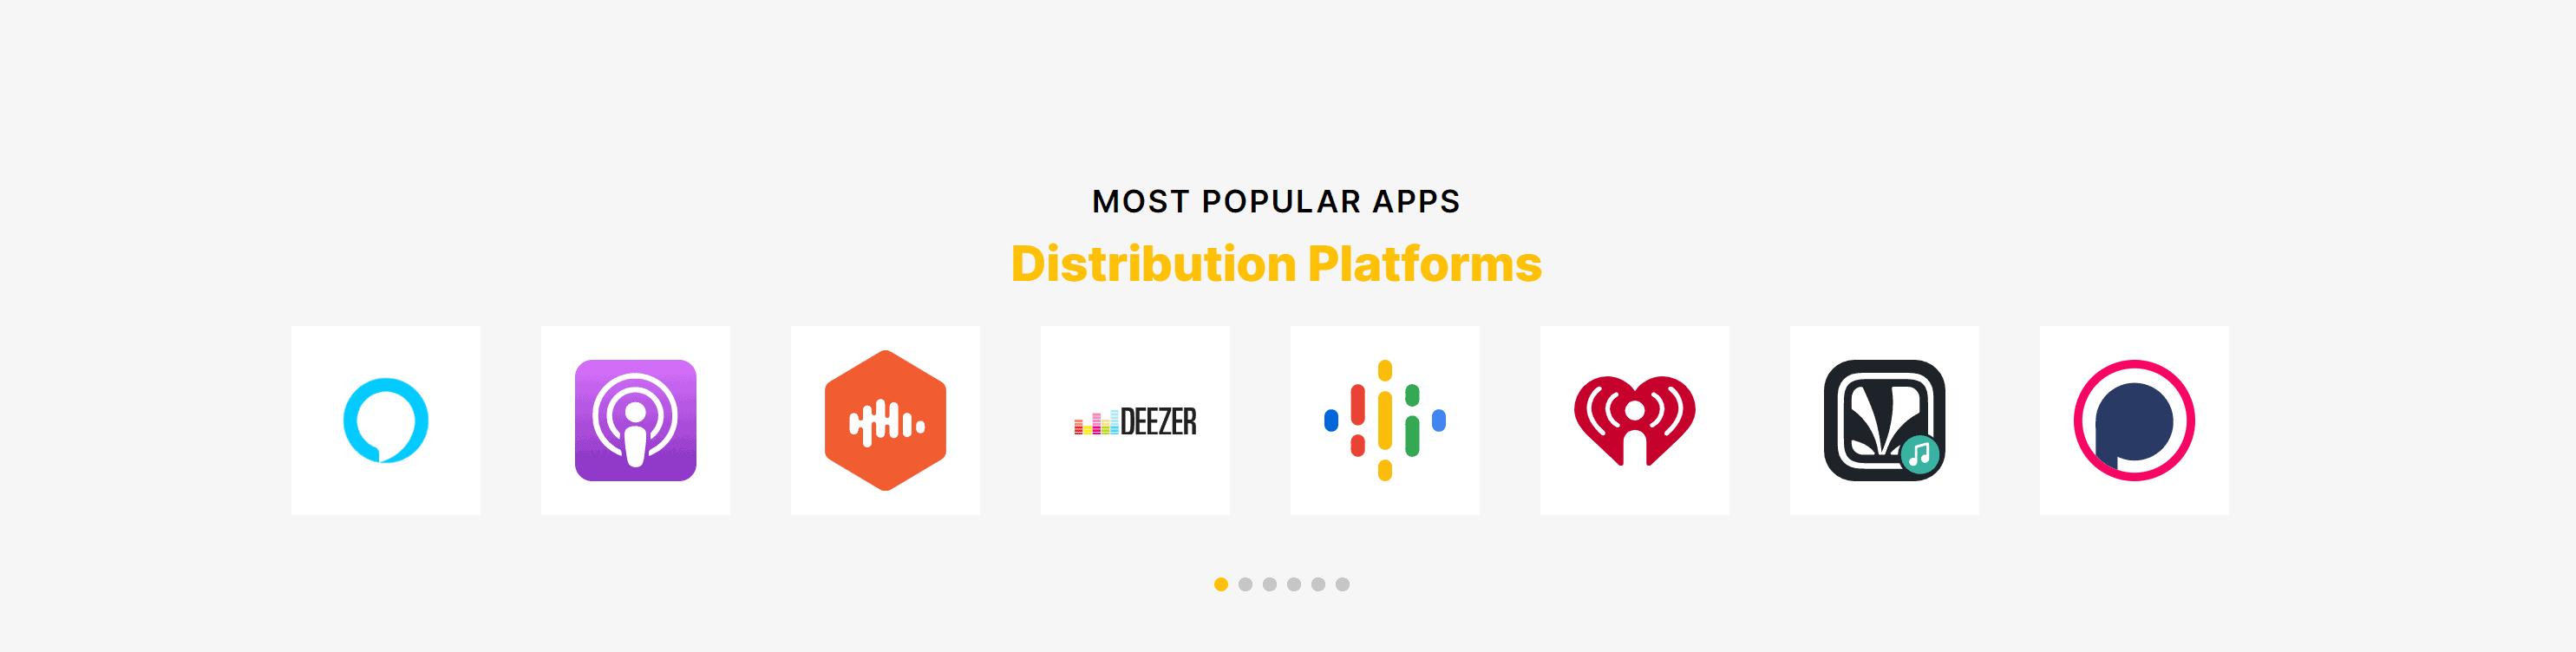 Spreaker discount coupons-Popular distribution apps for Spreaker